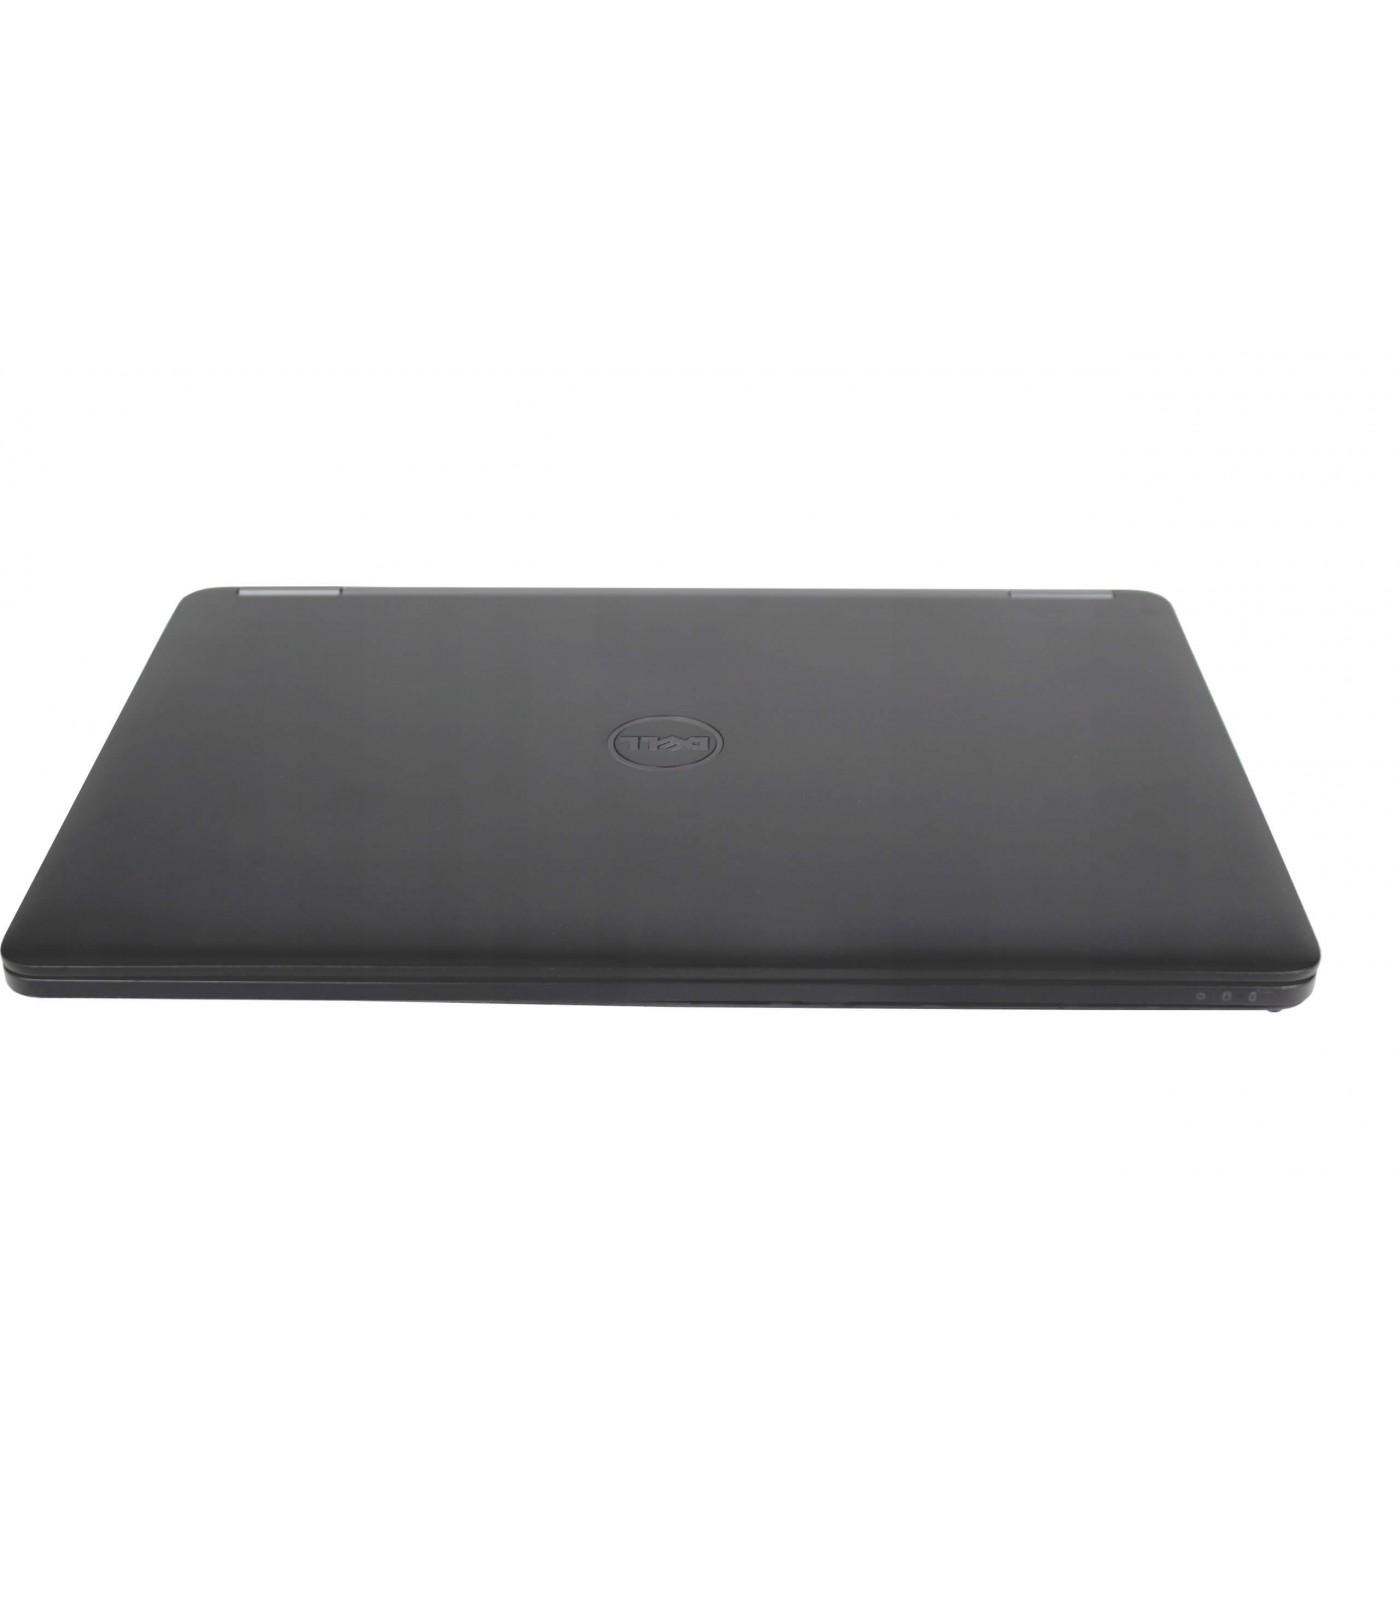 Poleasingowy laptop Dell Latitude E7270 z Intel Core i5-6300U w klasie A